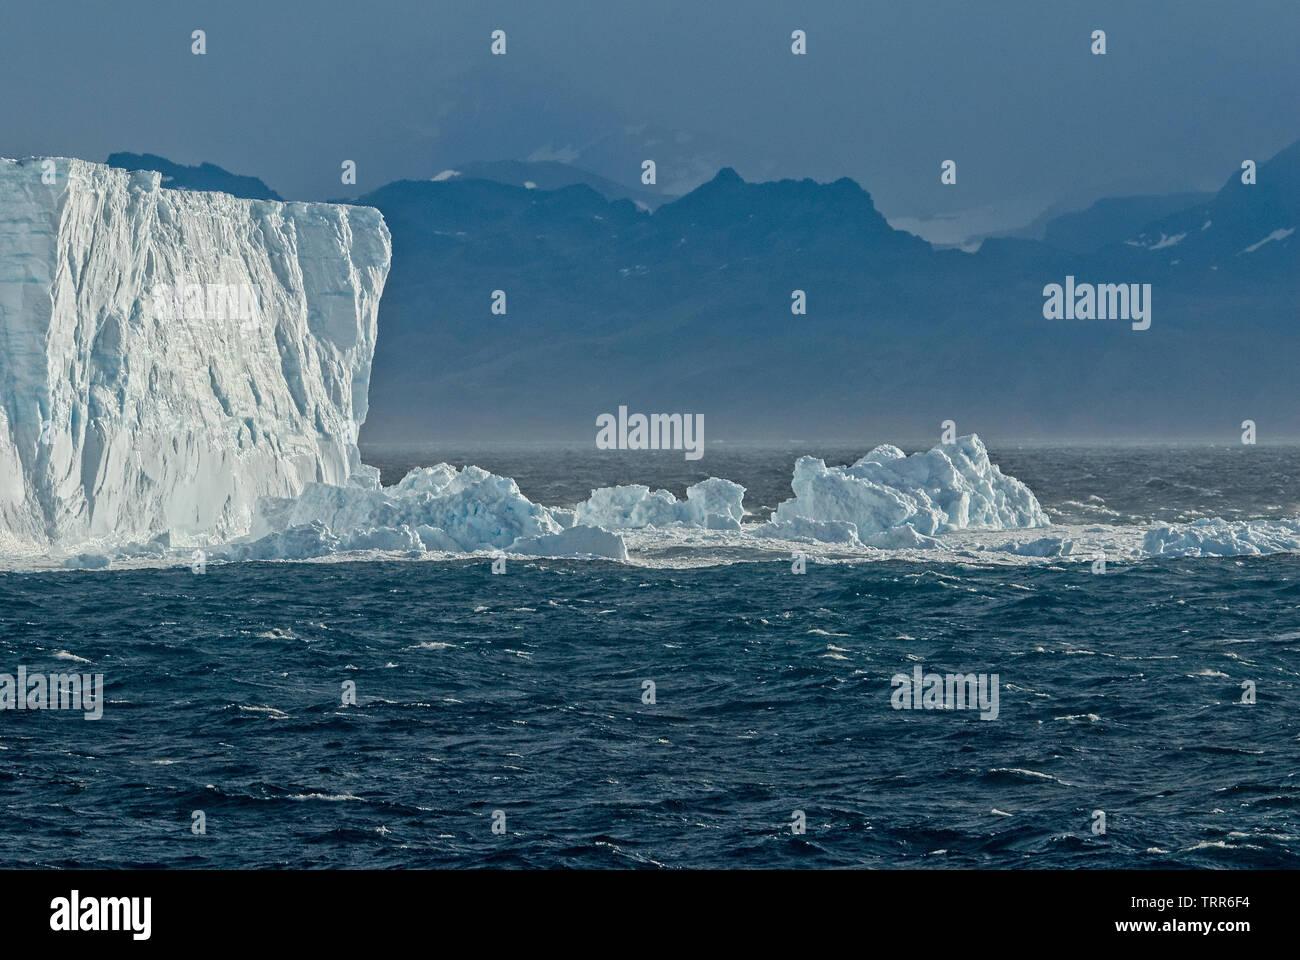 Cleaving iceberg off the coast of South Georgia Antartica Stock Photo